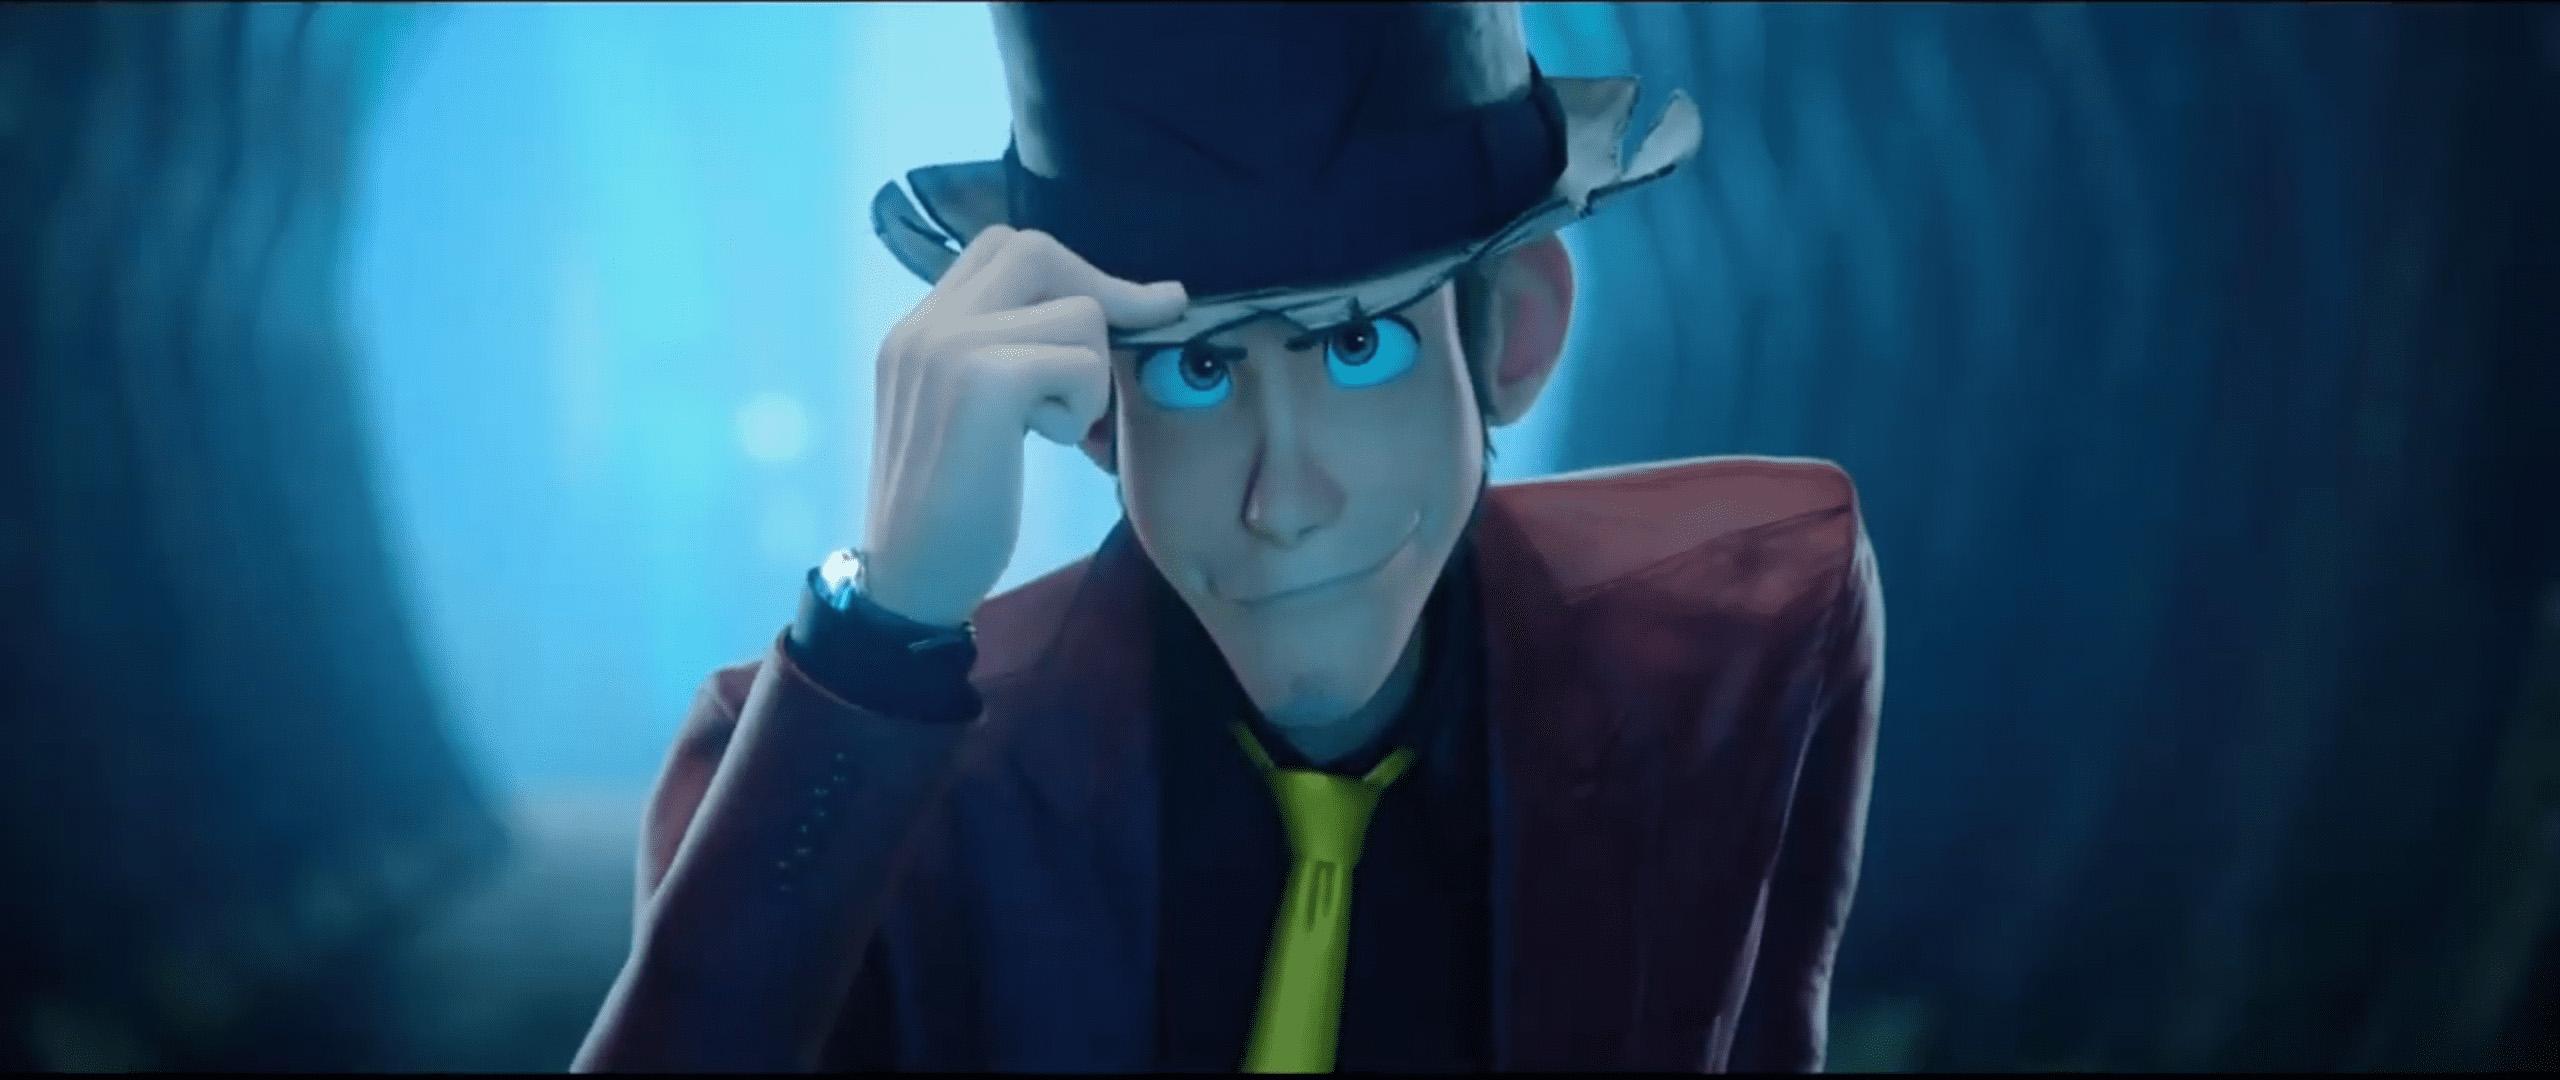 Lupin III : Le gentleman cambrioleur du manga !